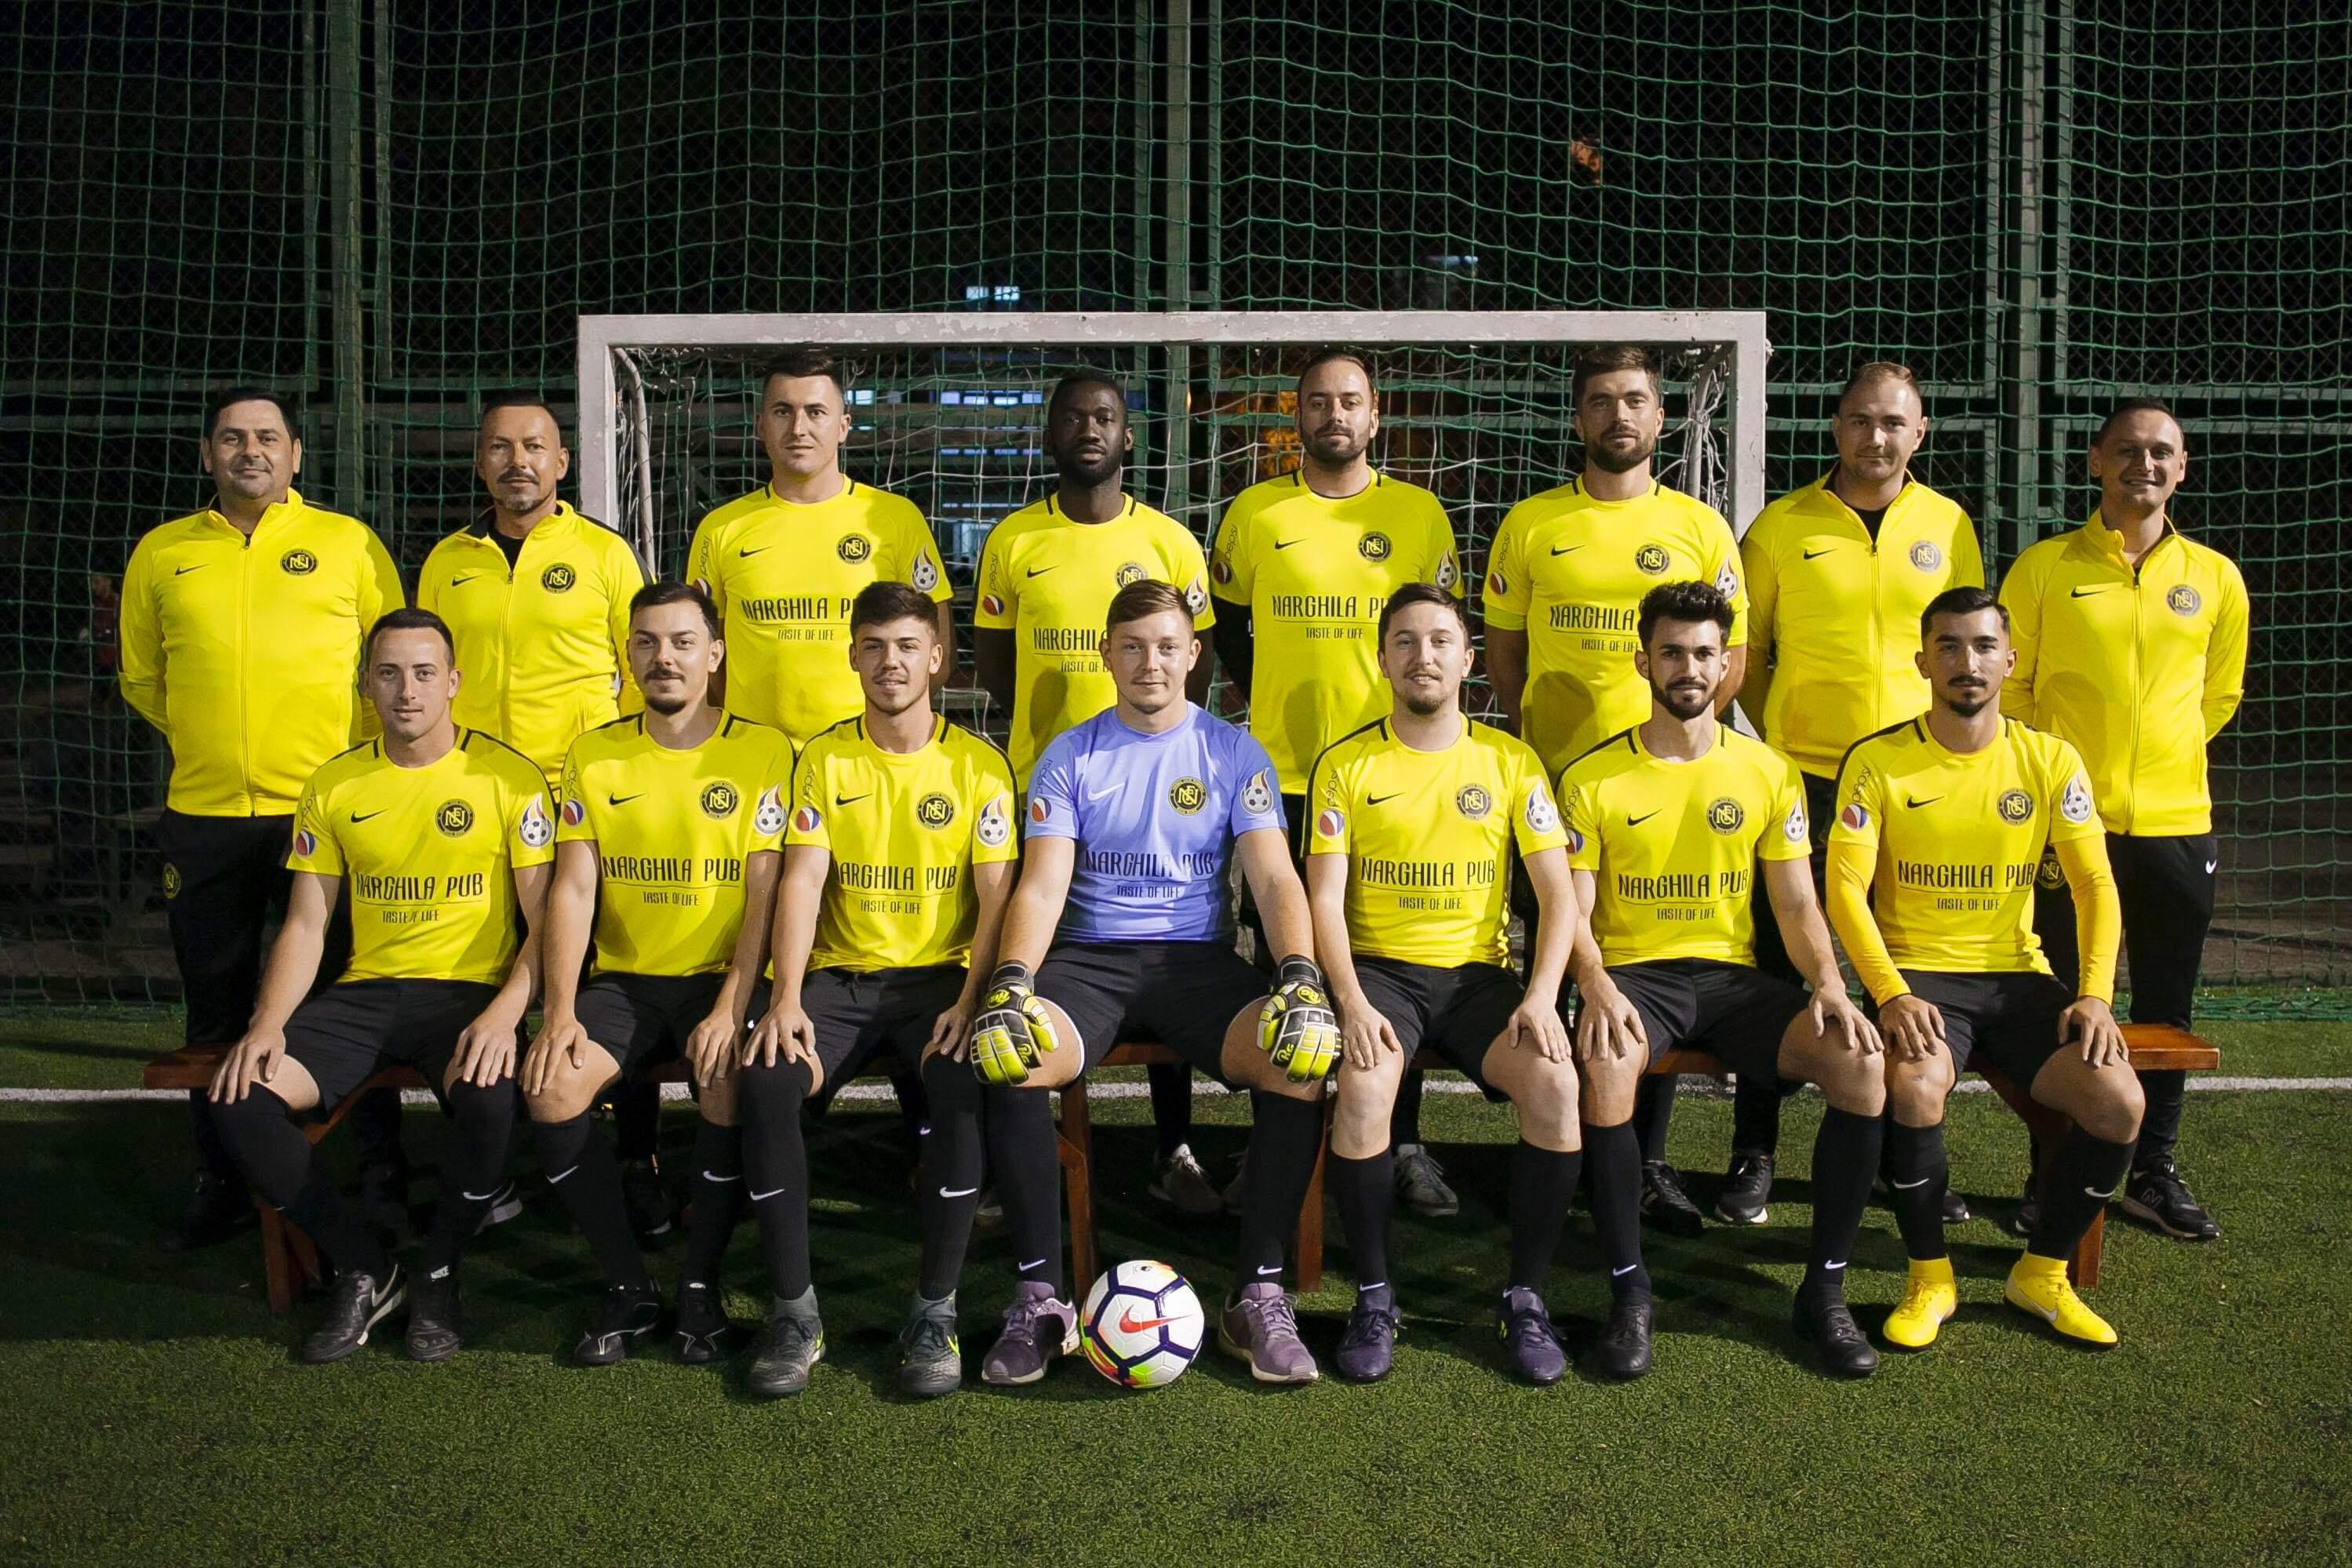 FC NARGHILA